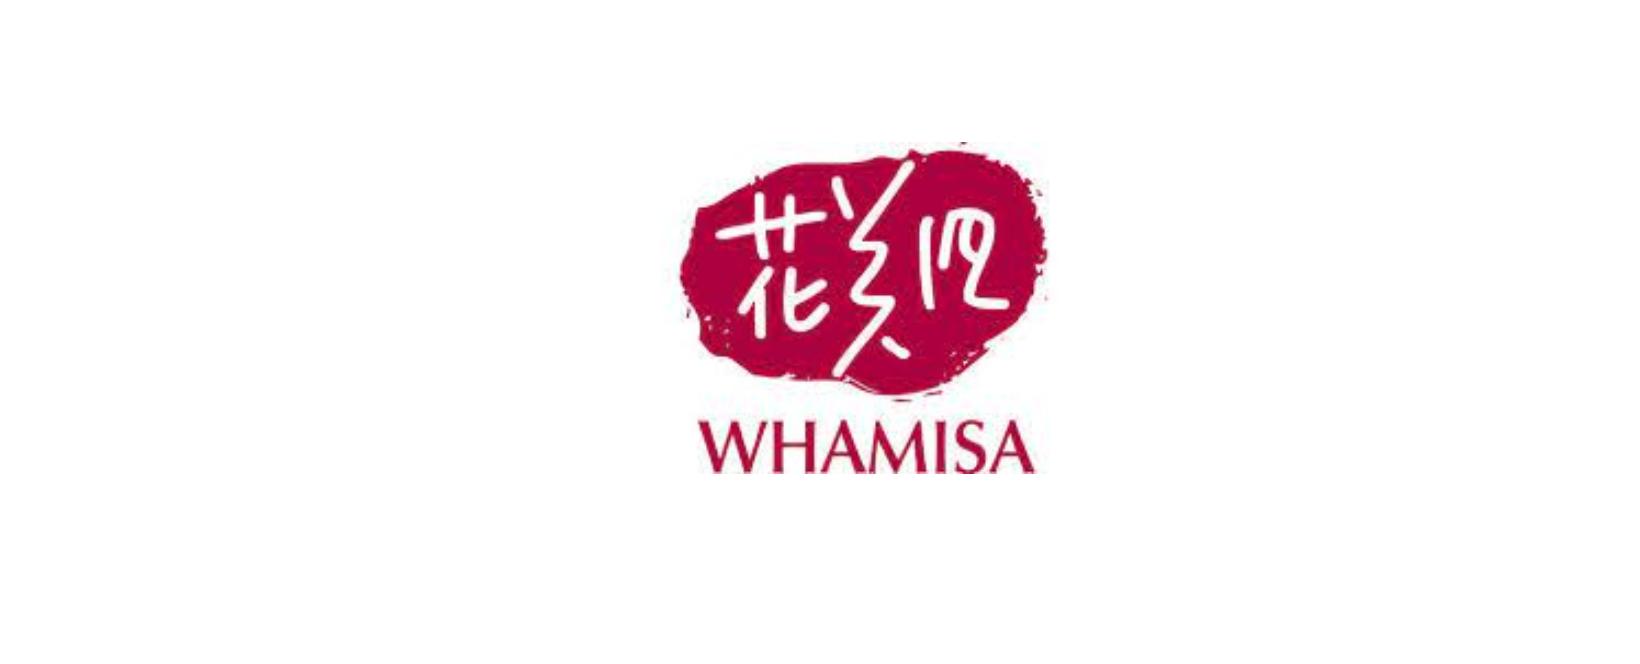 Whamisa Discount Code 2021